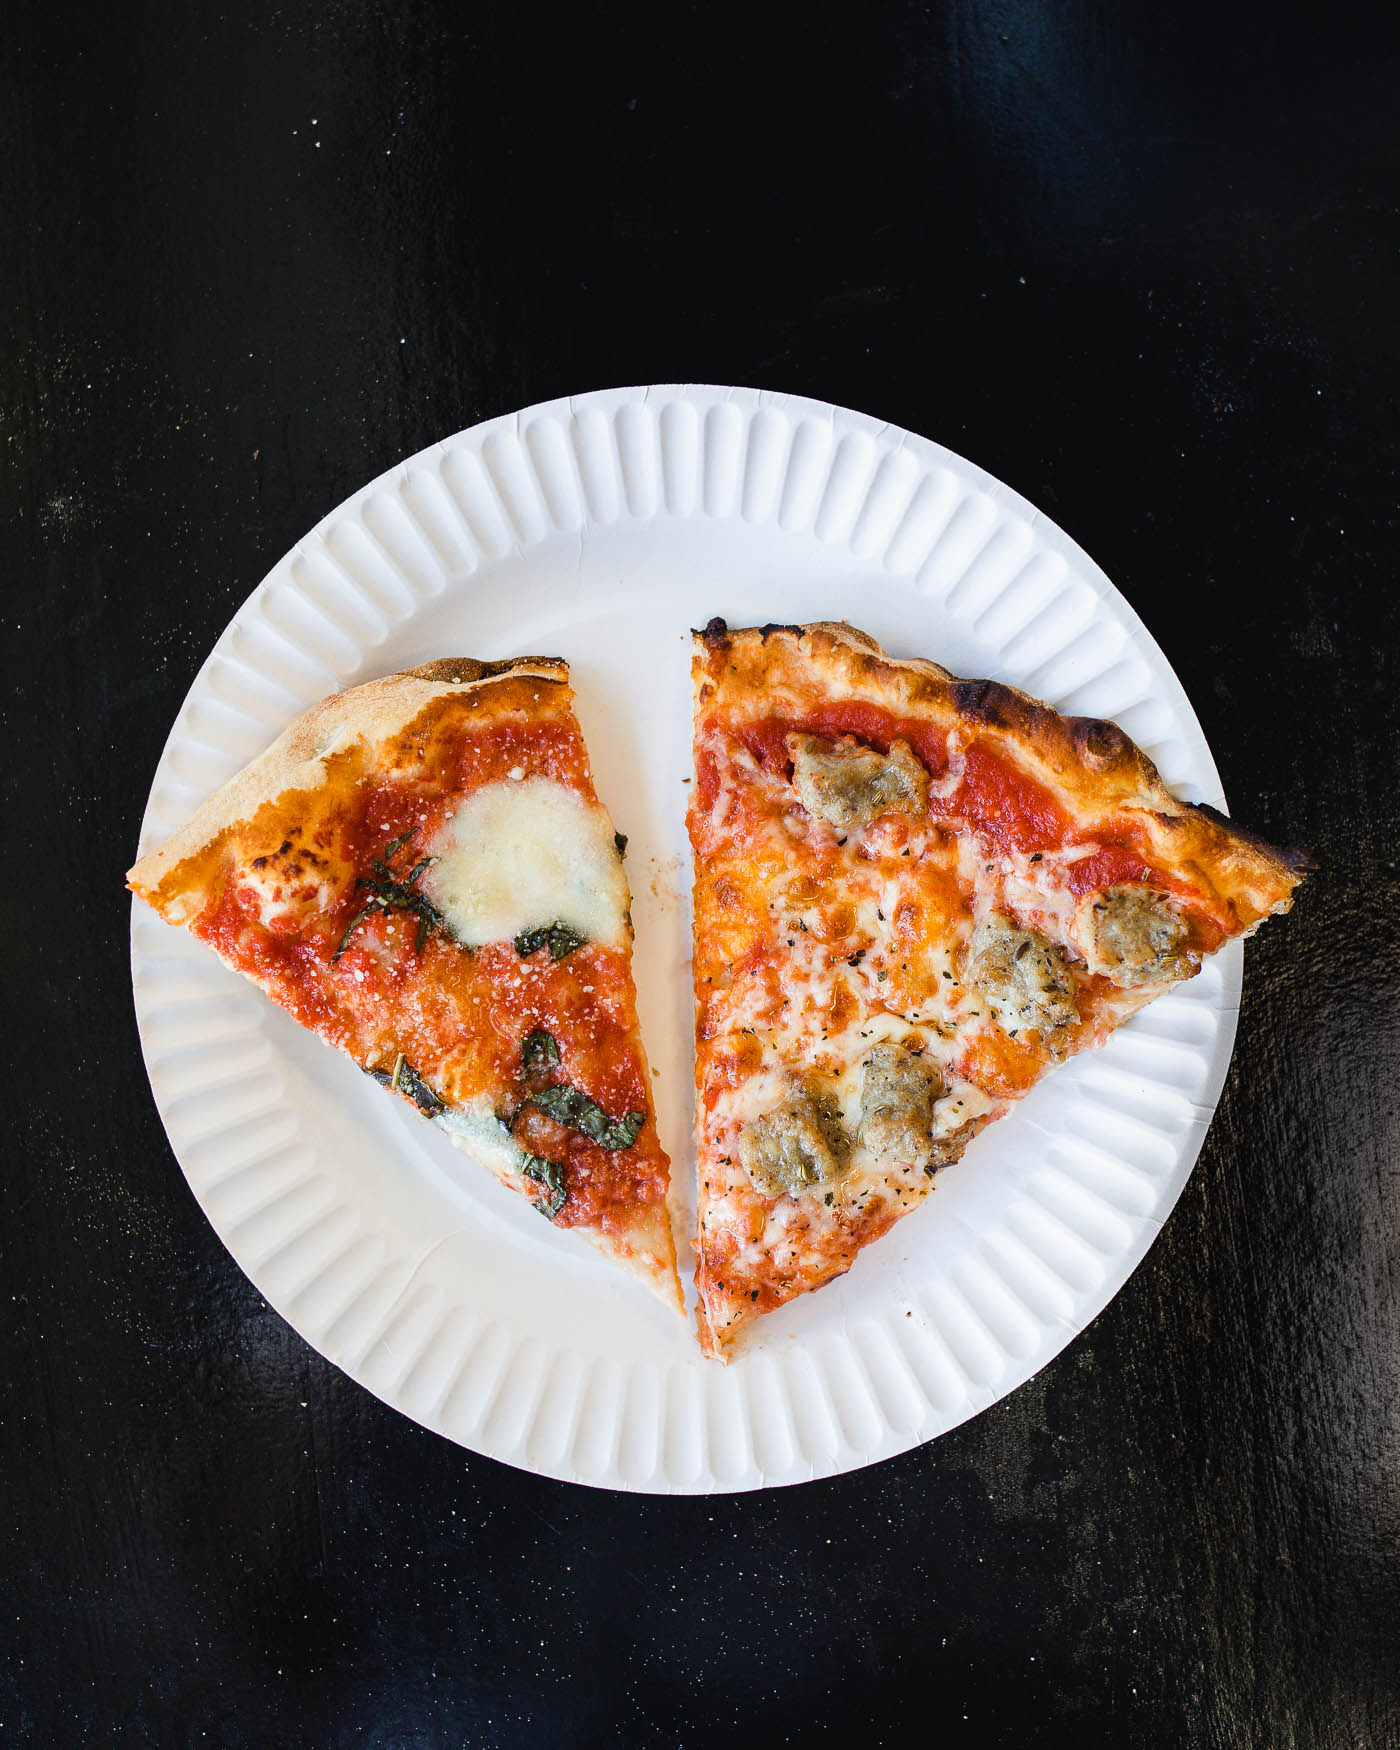 feast-of-st-pizza-ocnj-002.jpg